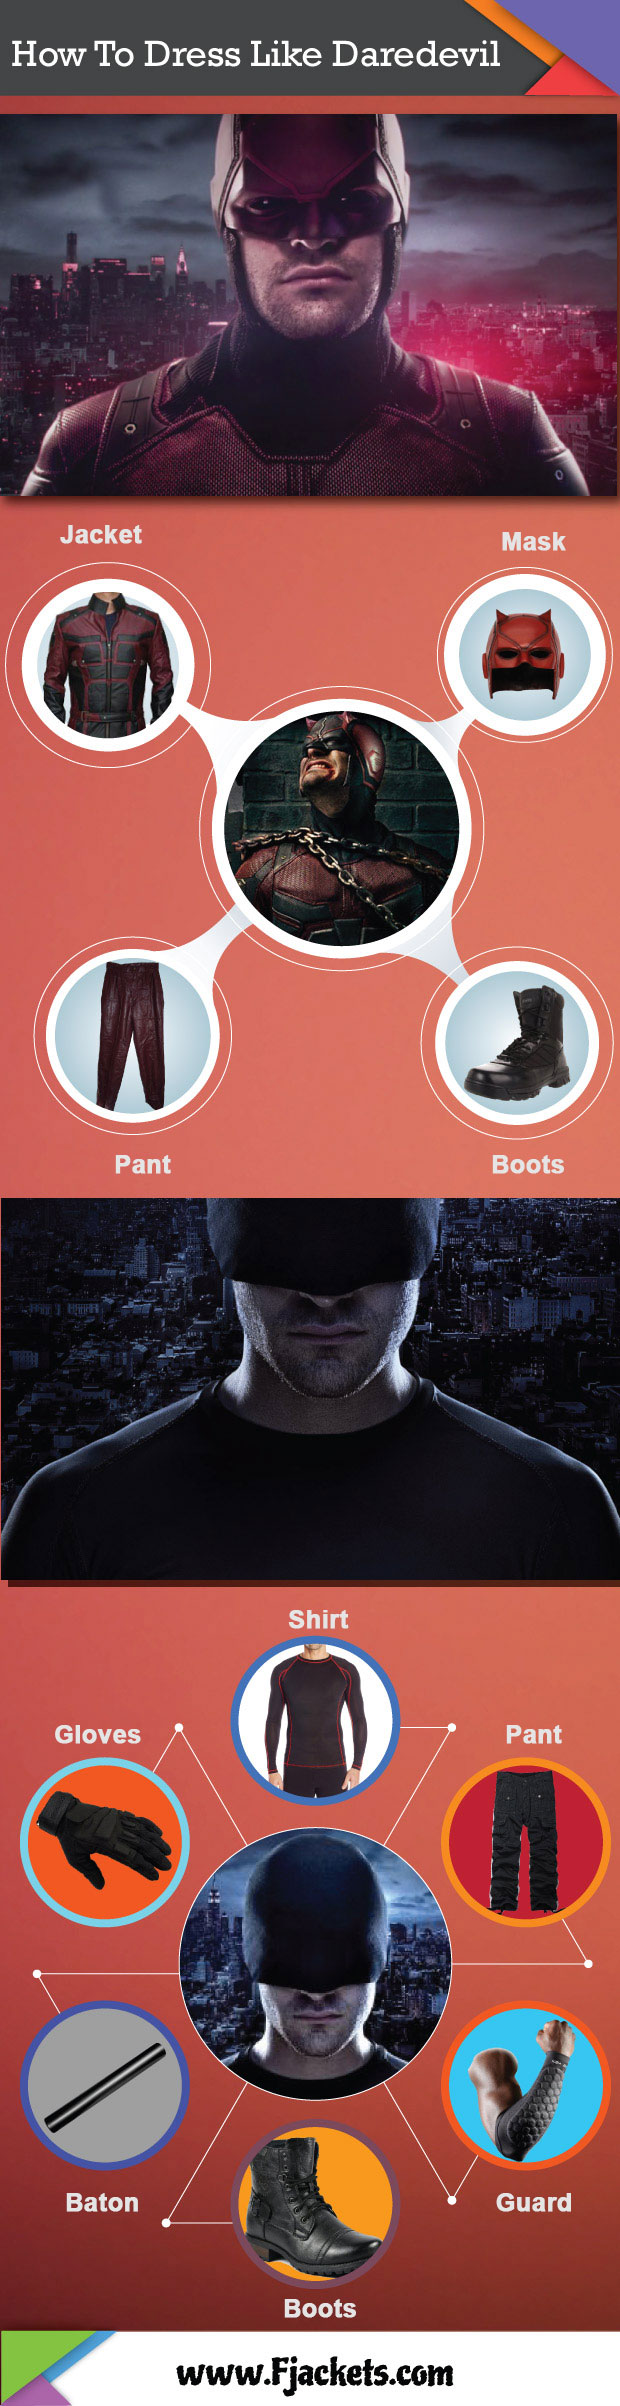 Daredevil Infographic